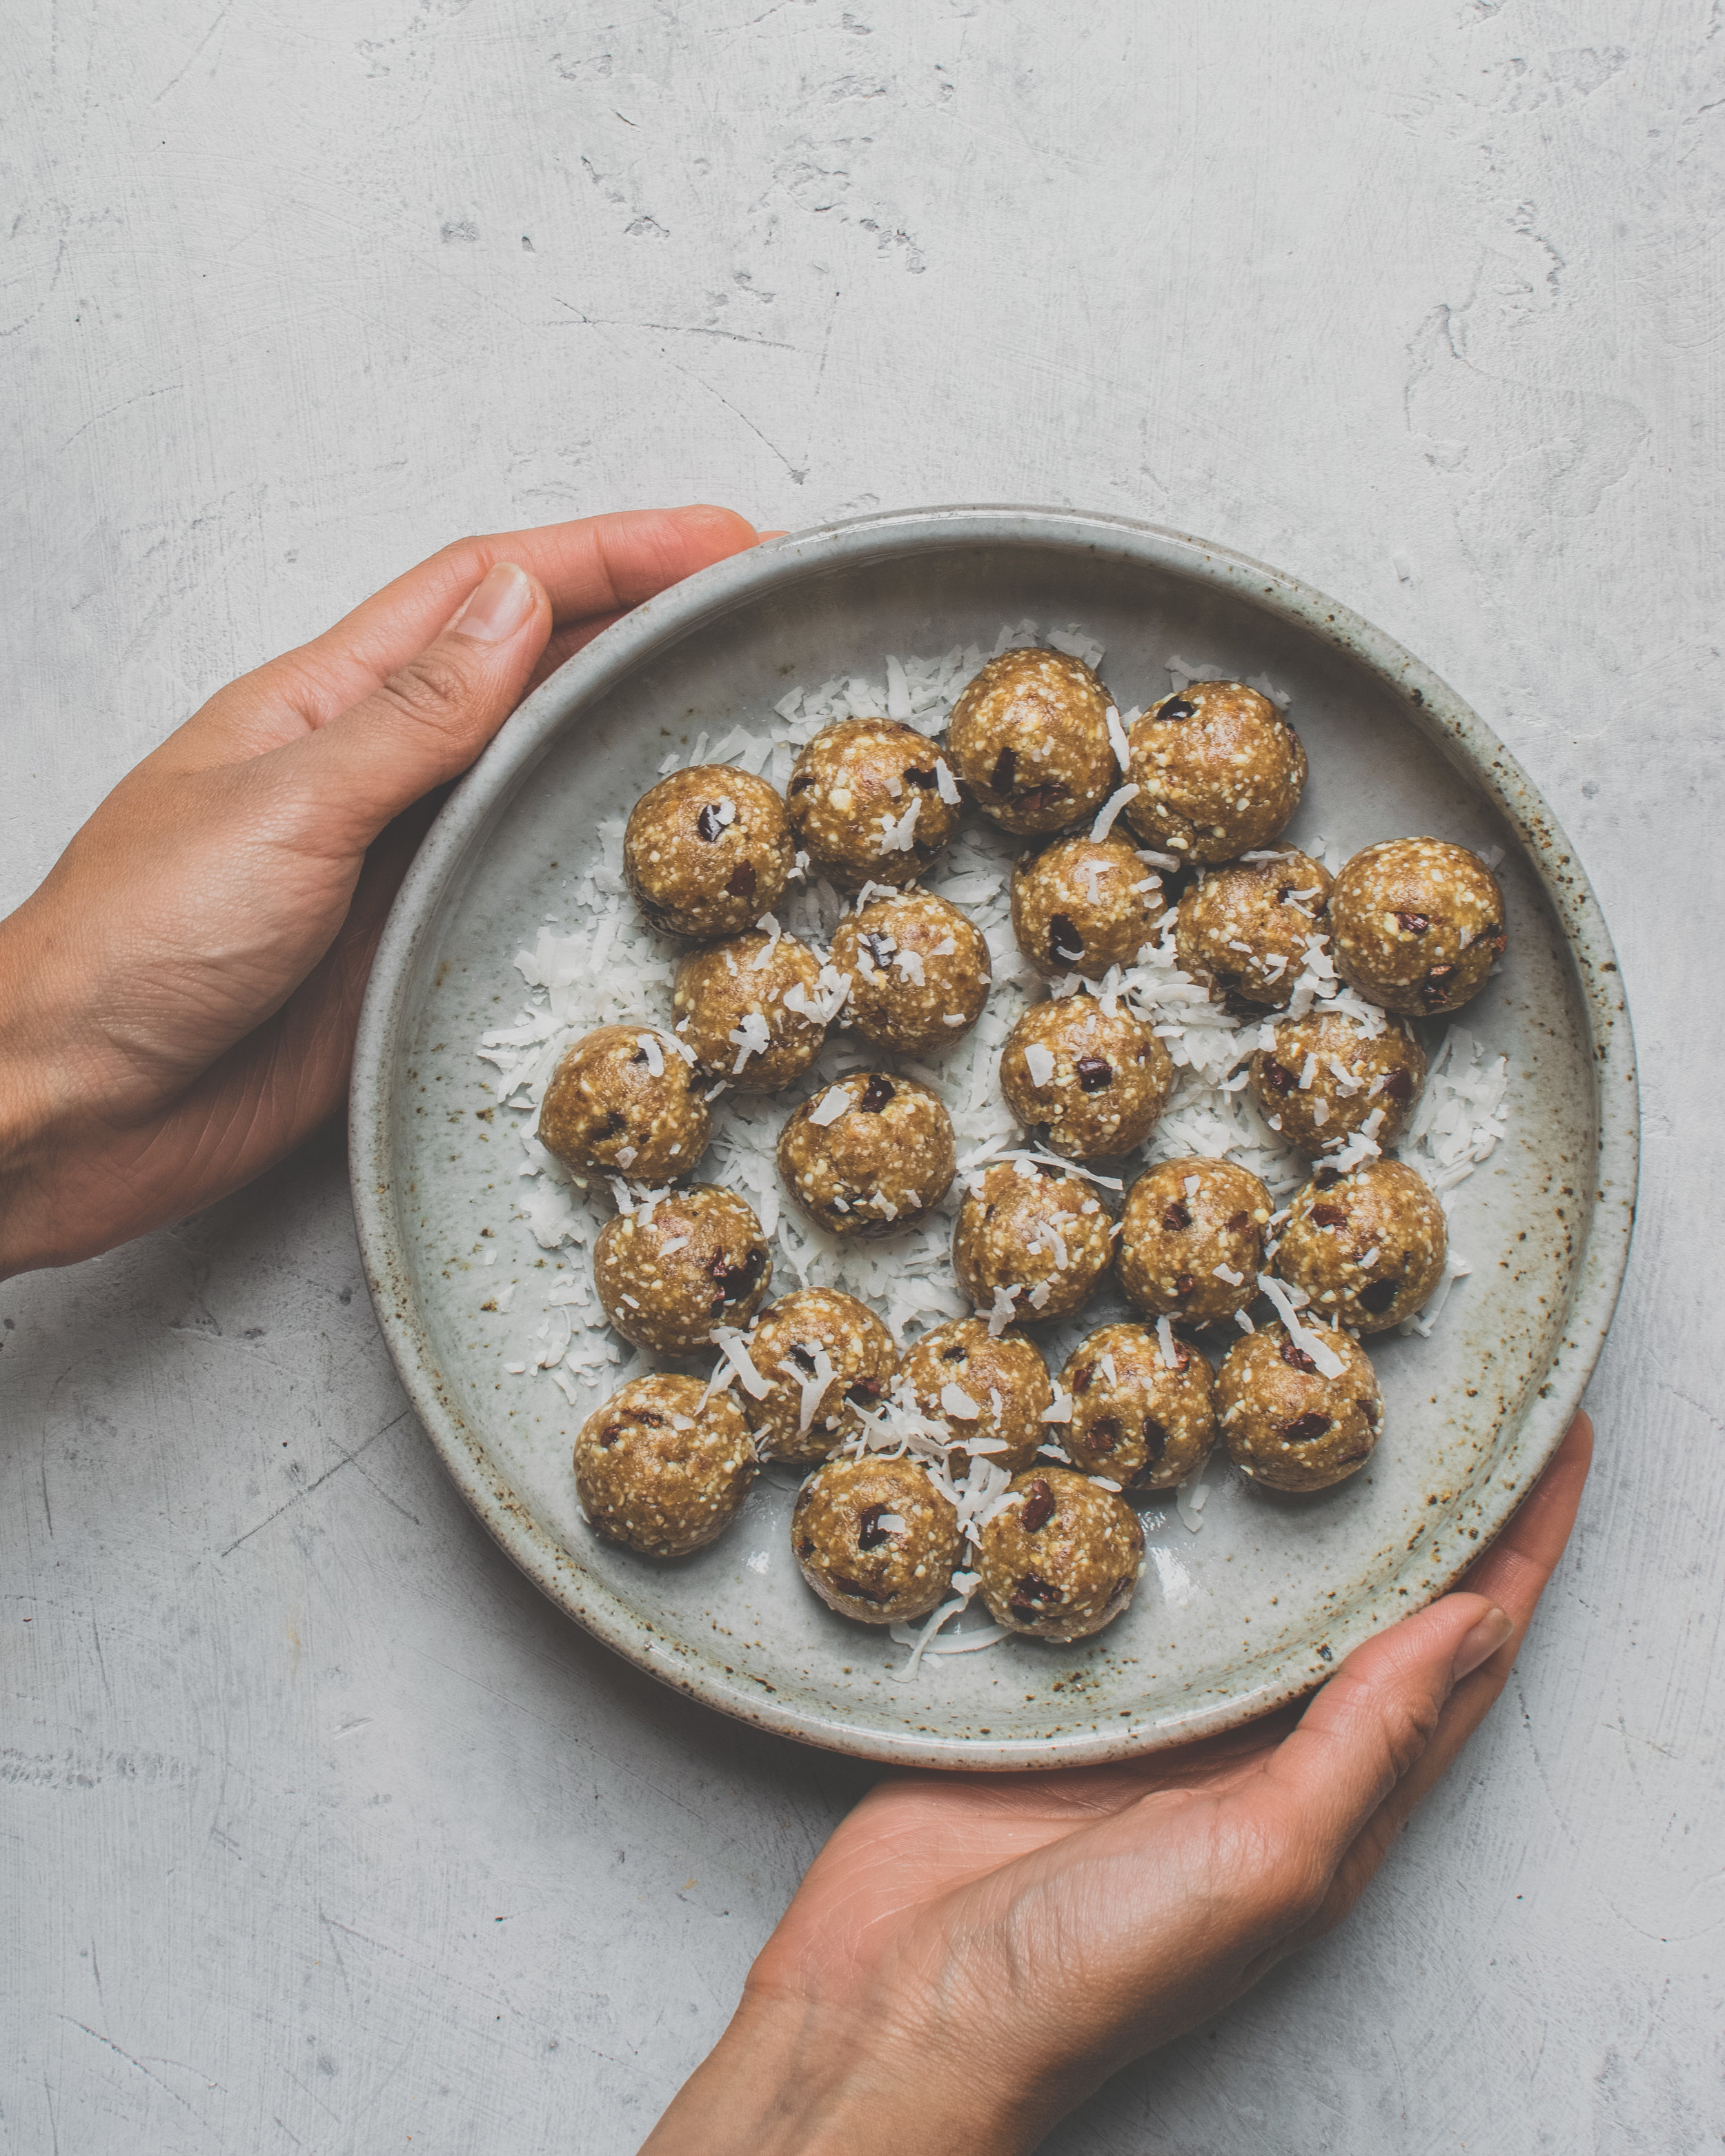 Salted Caramel Cookie Dough Bites* - Raw Vegan, Gluten-Free, Paleo